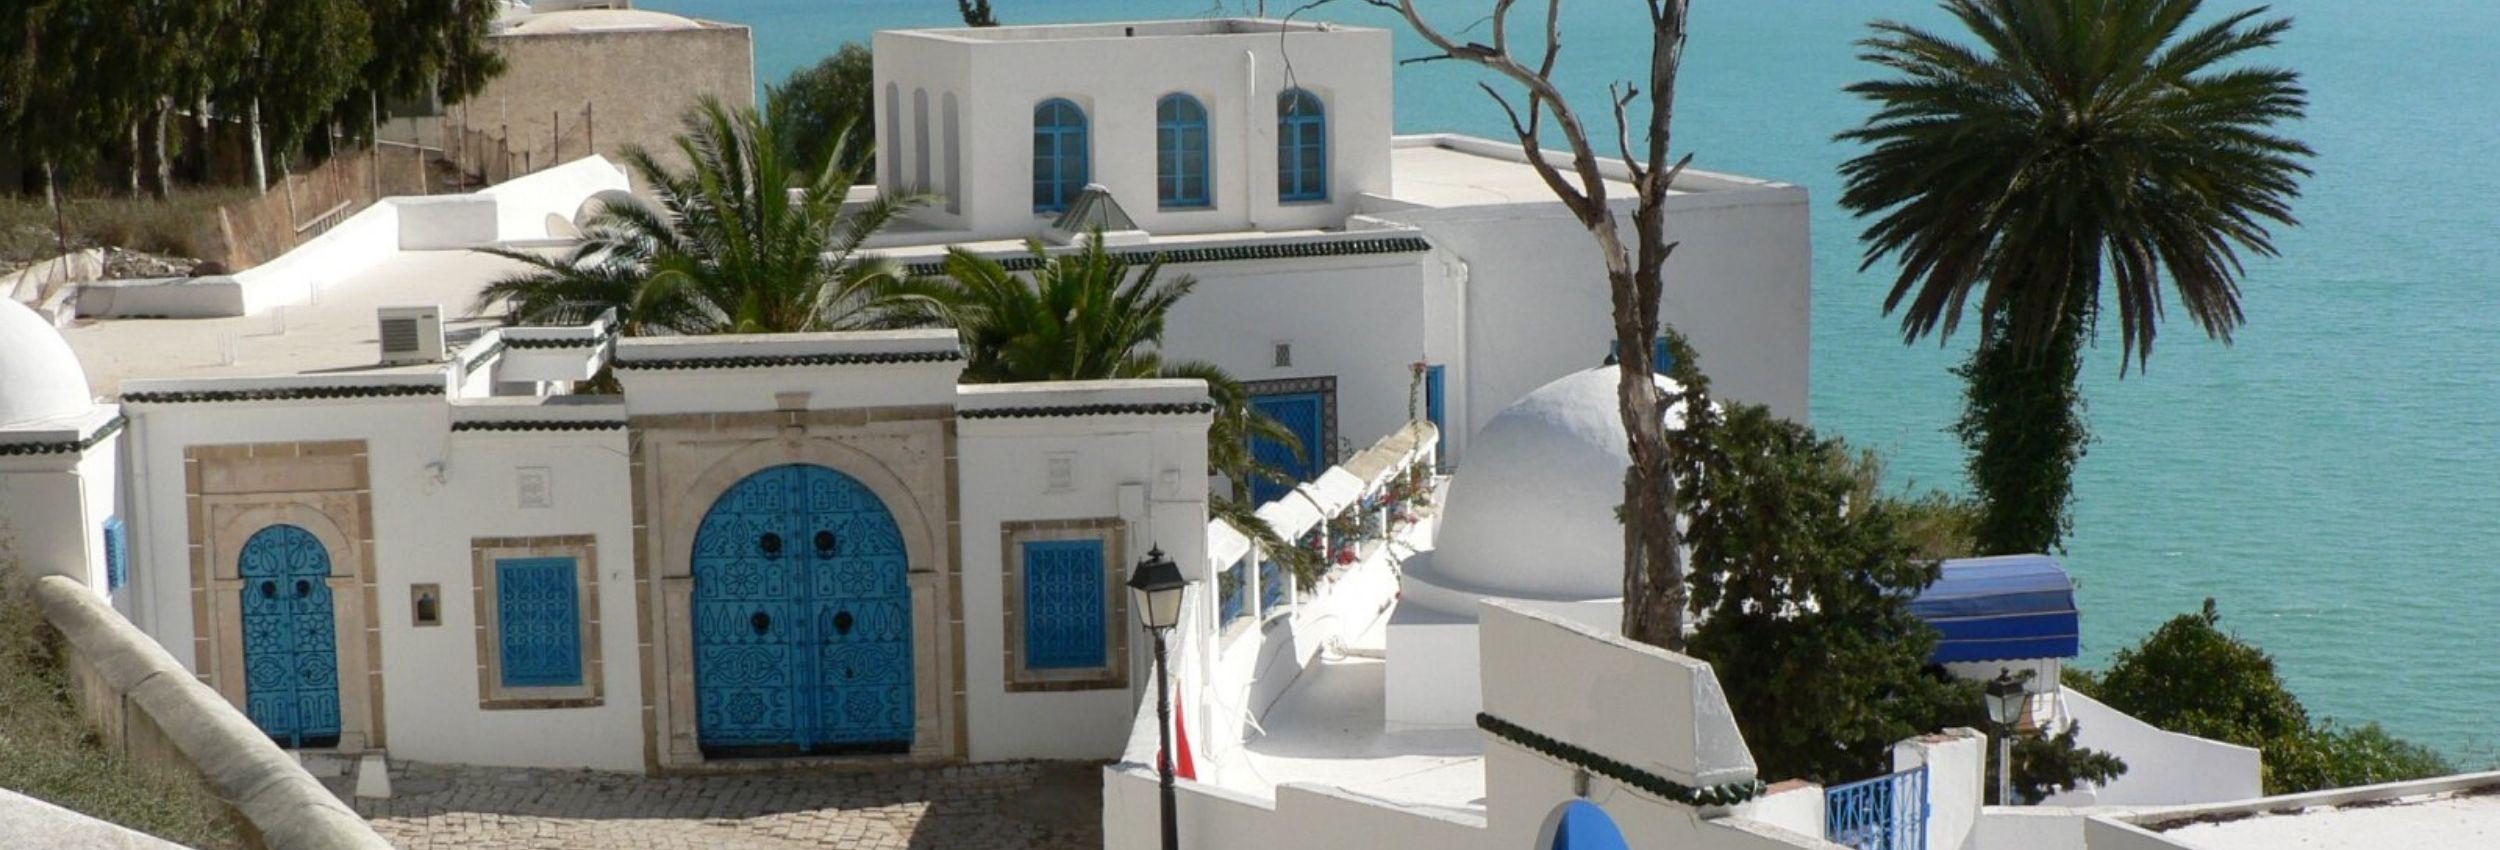 Tunisia2800x8001